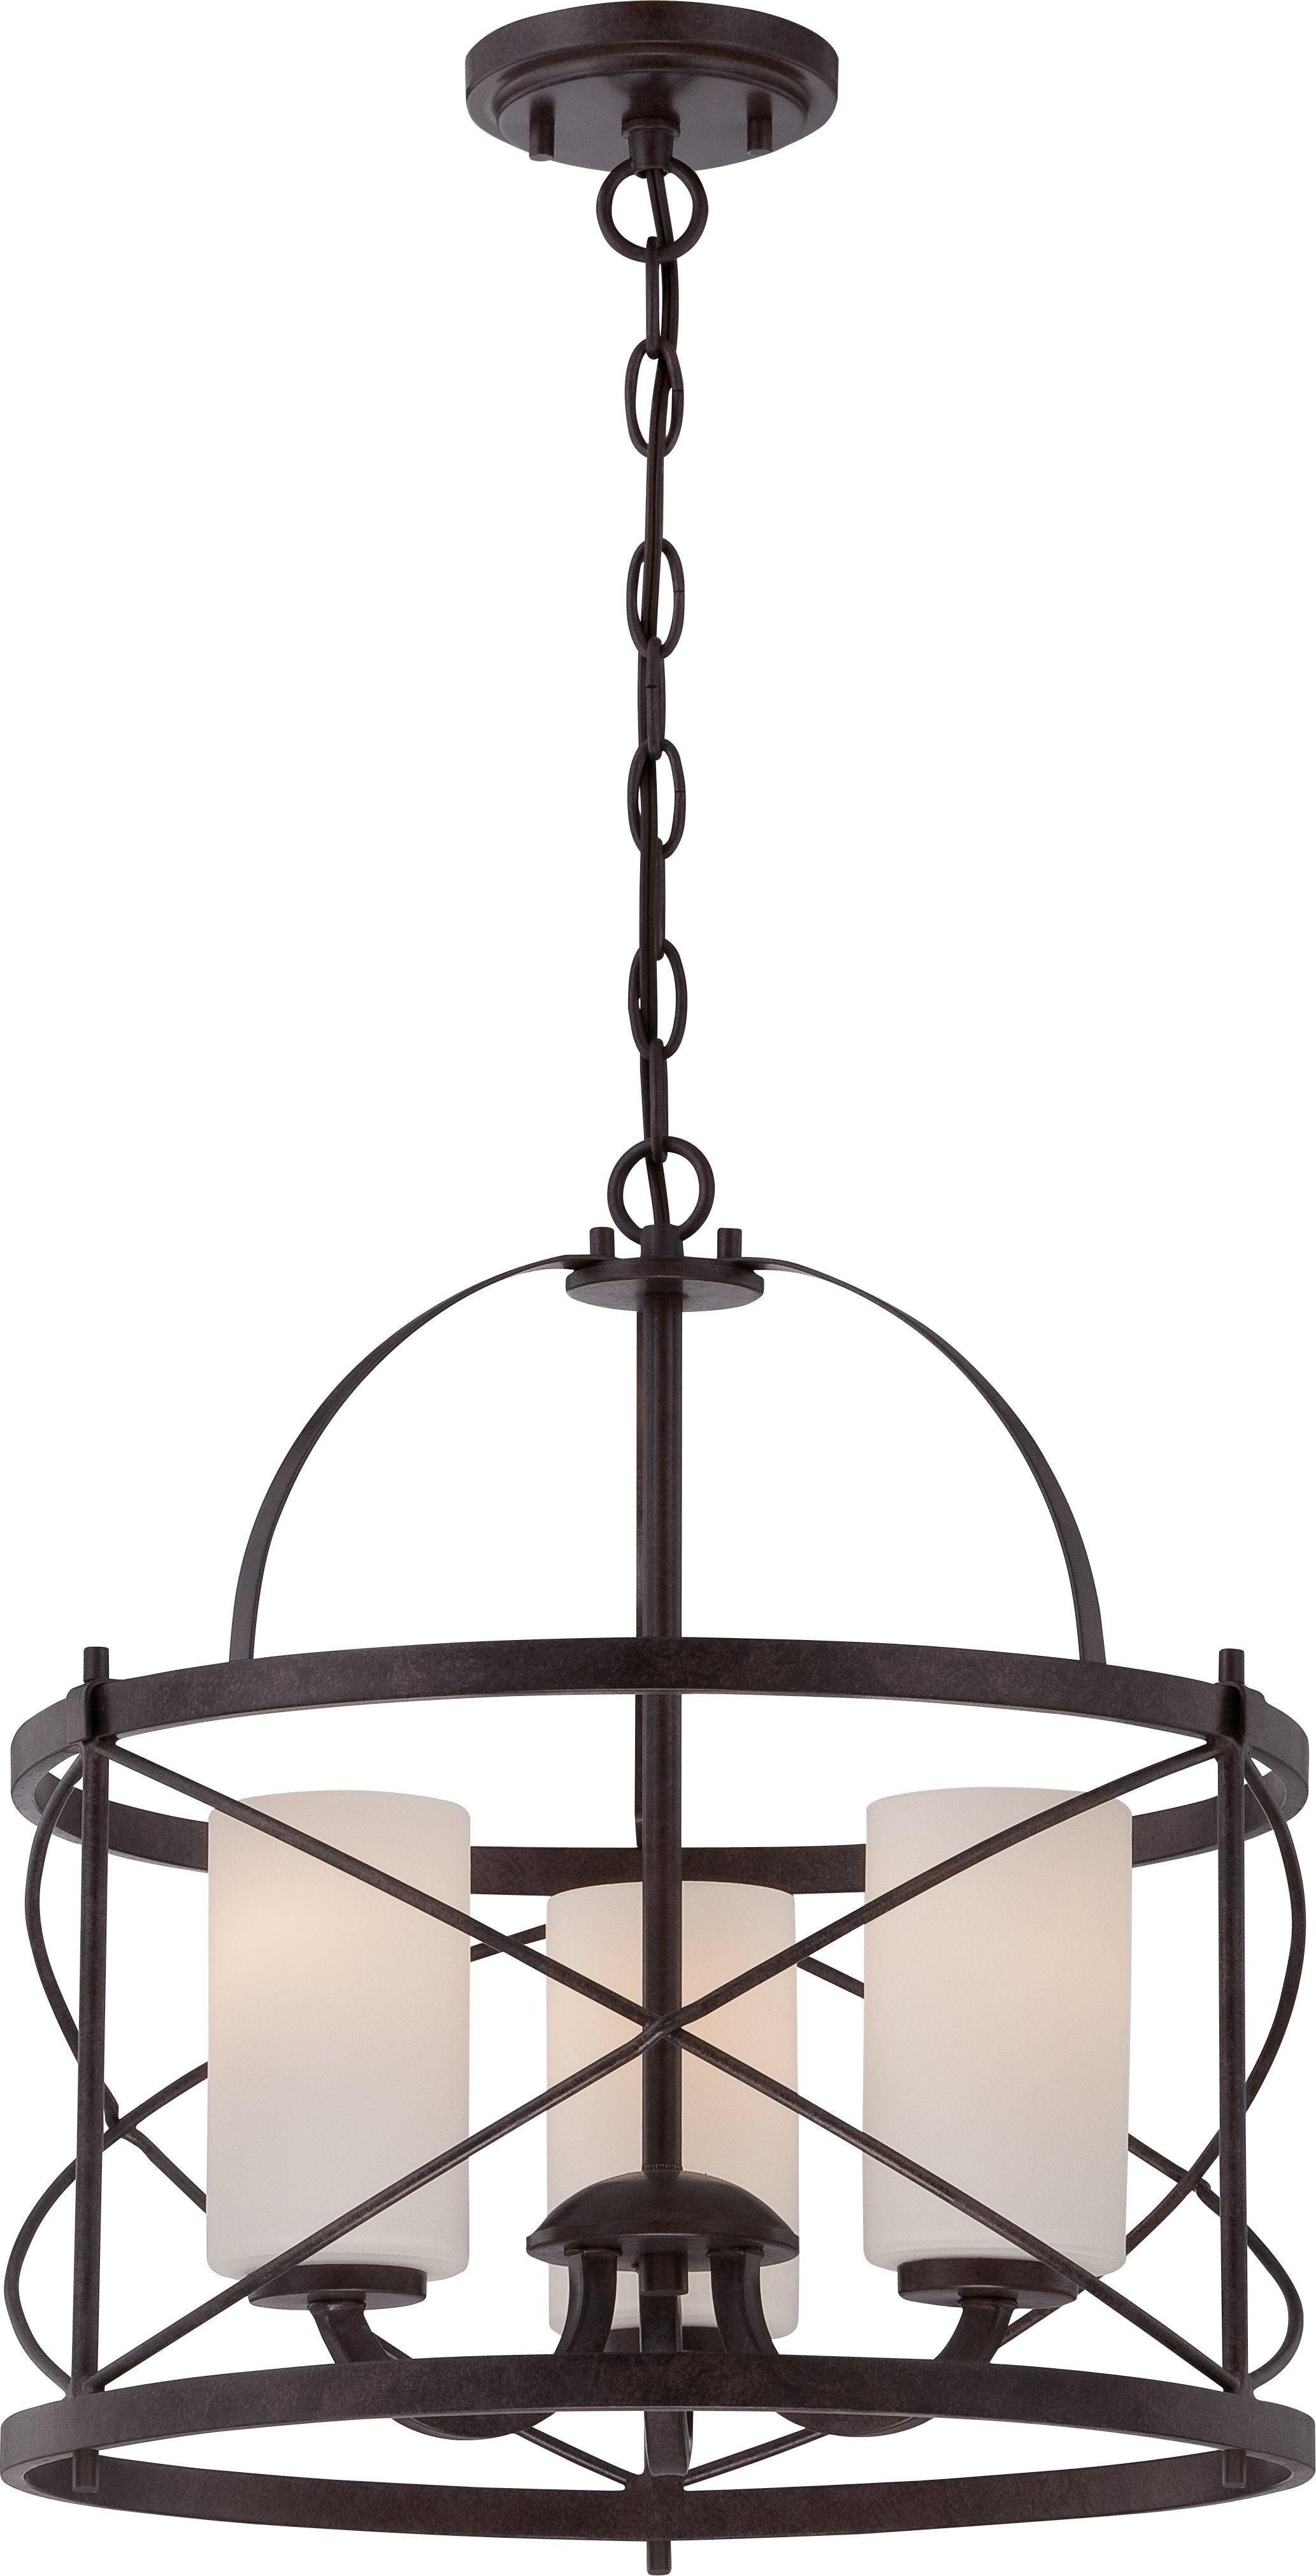 Darby Home Co Farrier 3Light Lantern Drum Pendant